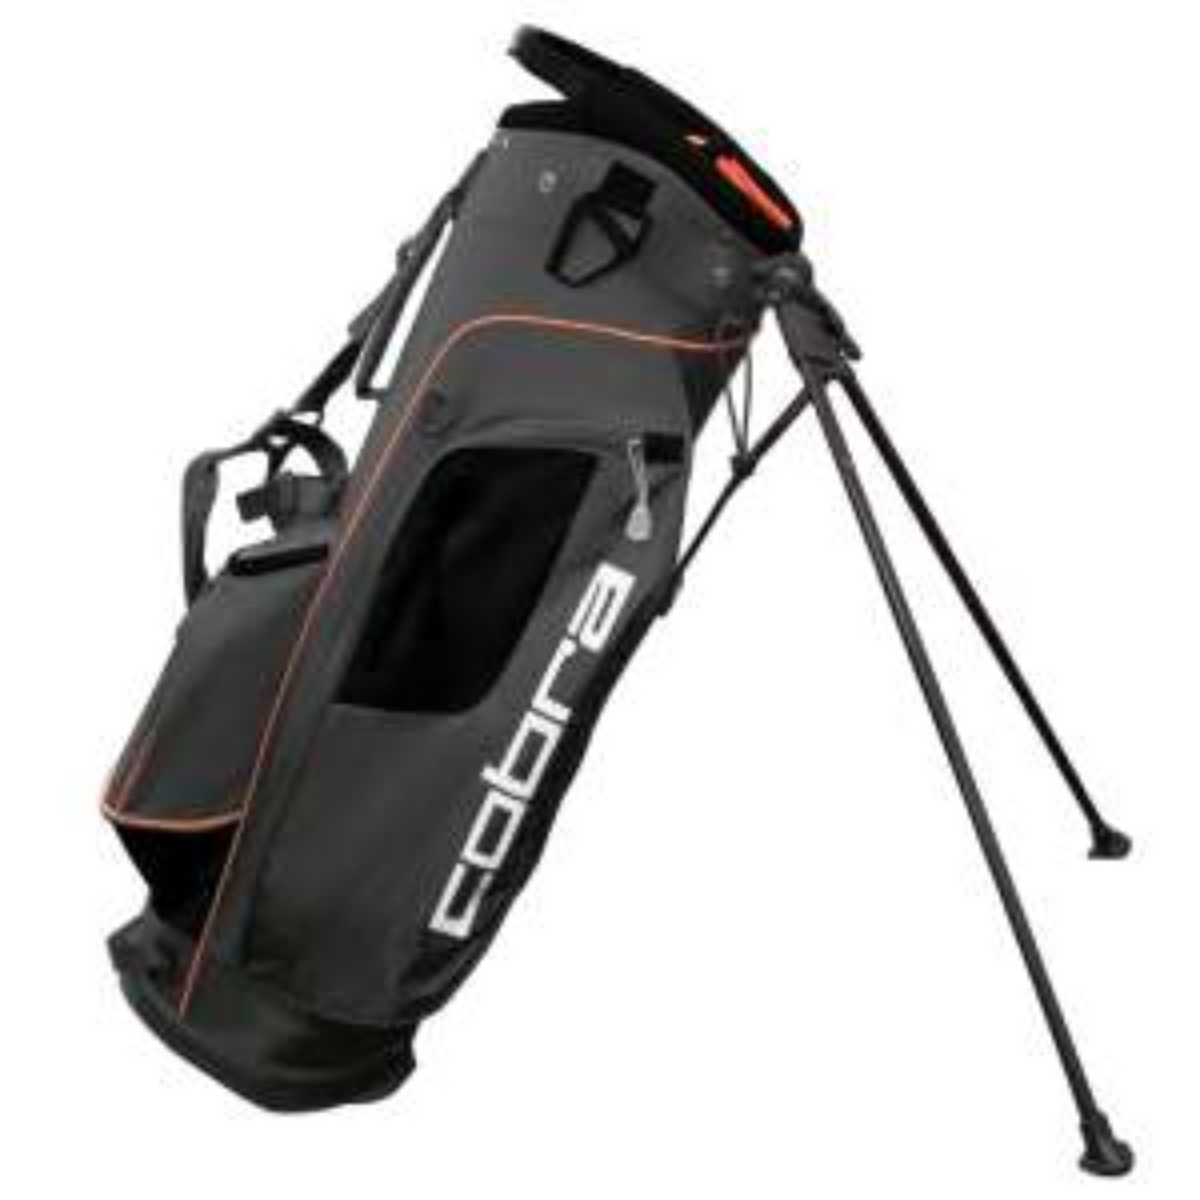 Cobra Golf XL Stand Bag £89 @ American Golf